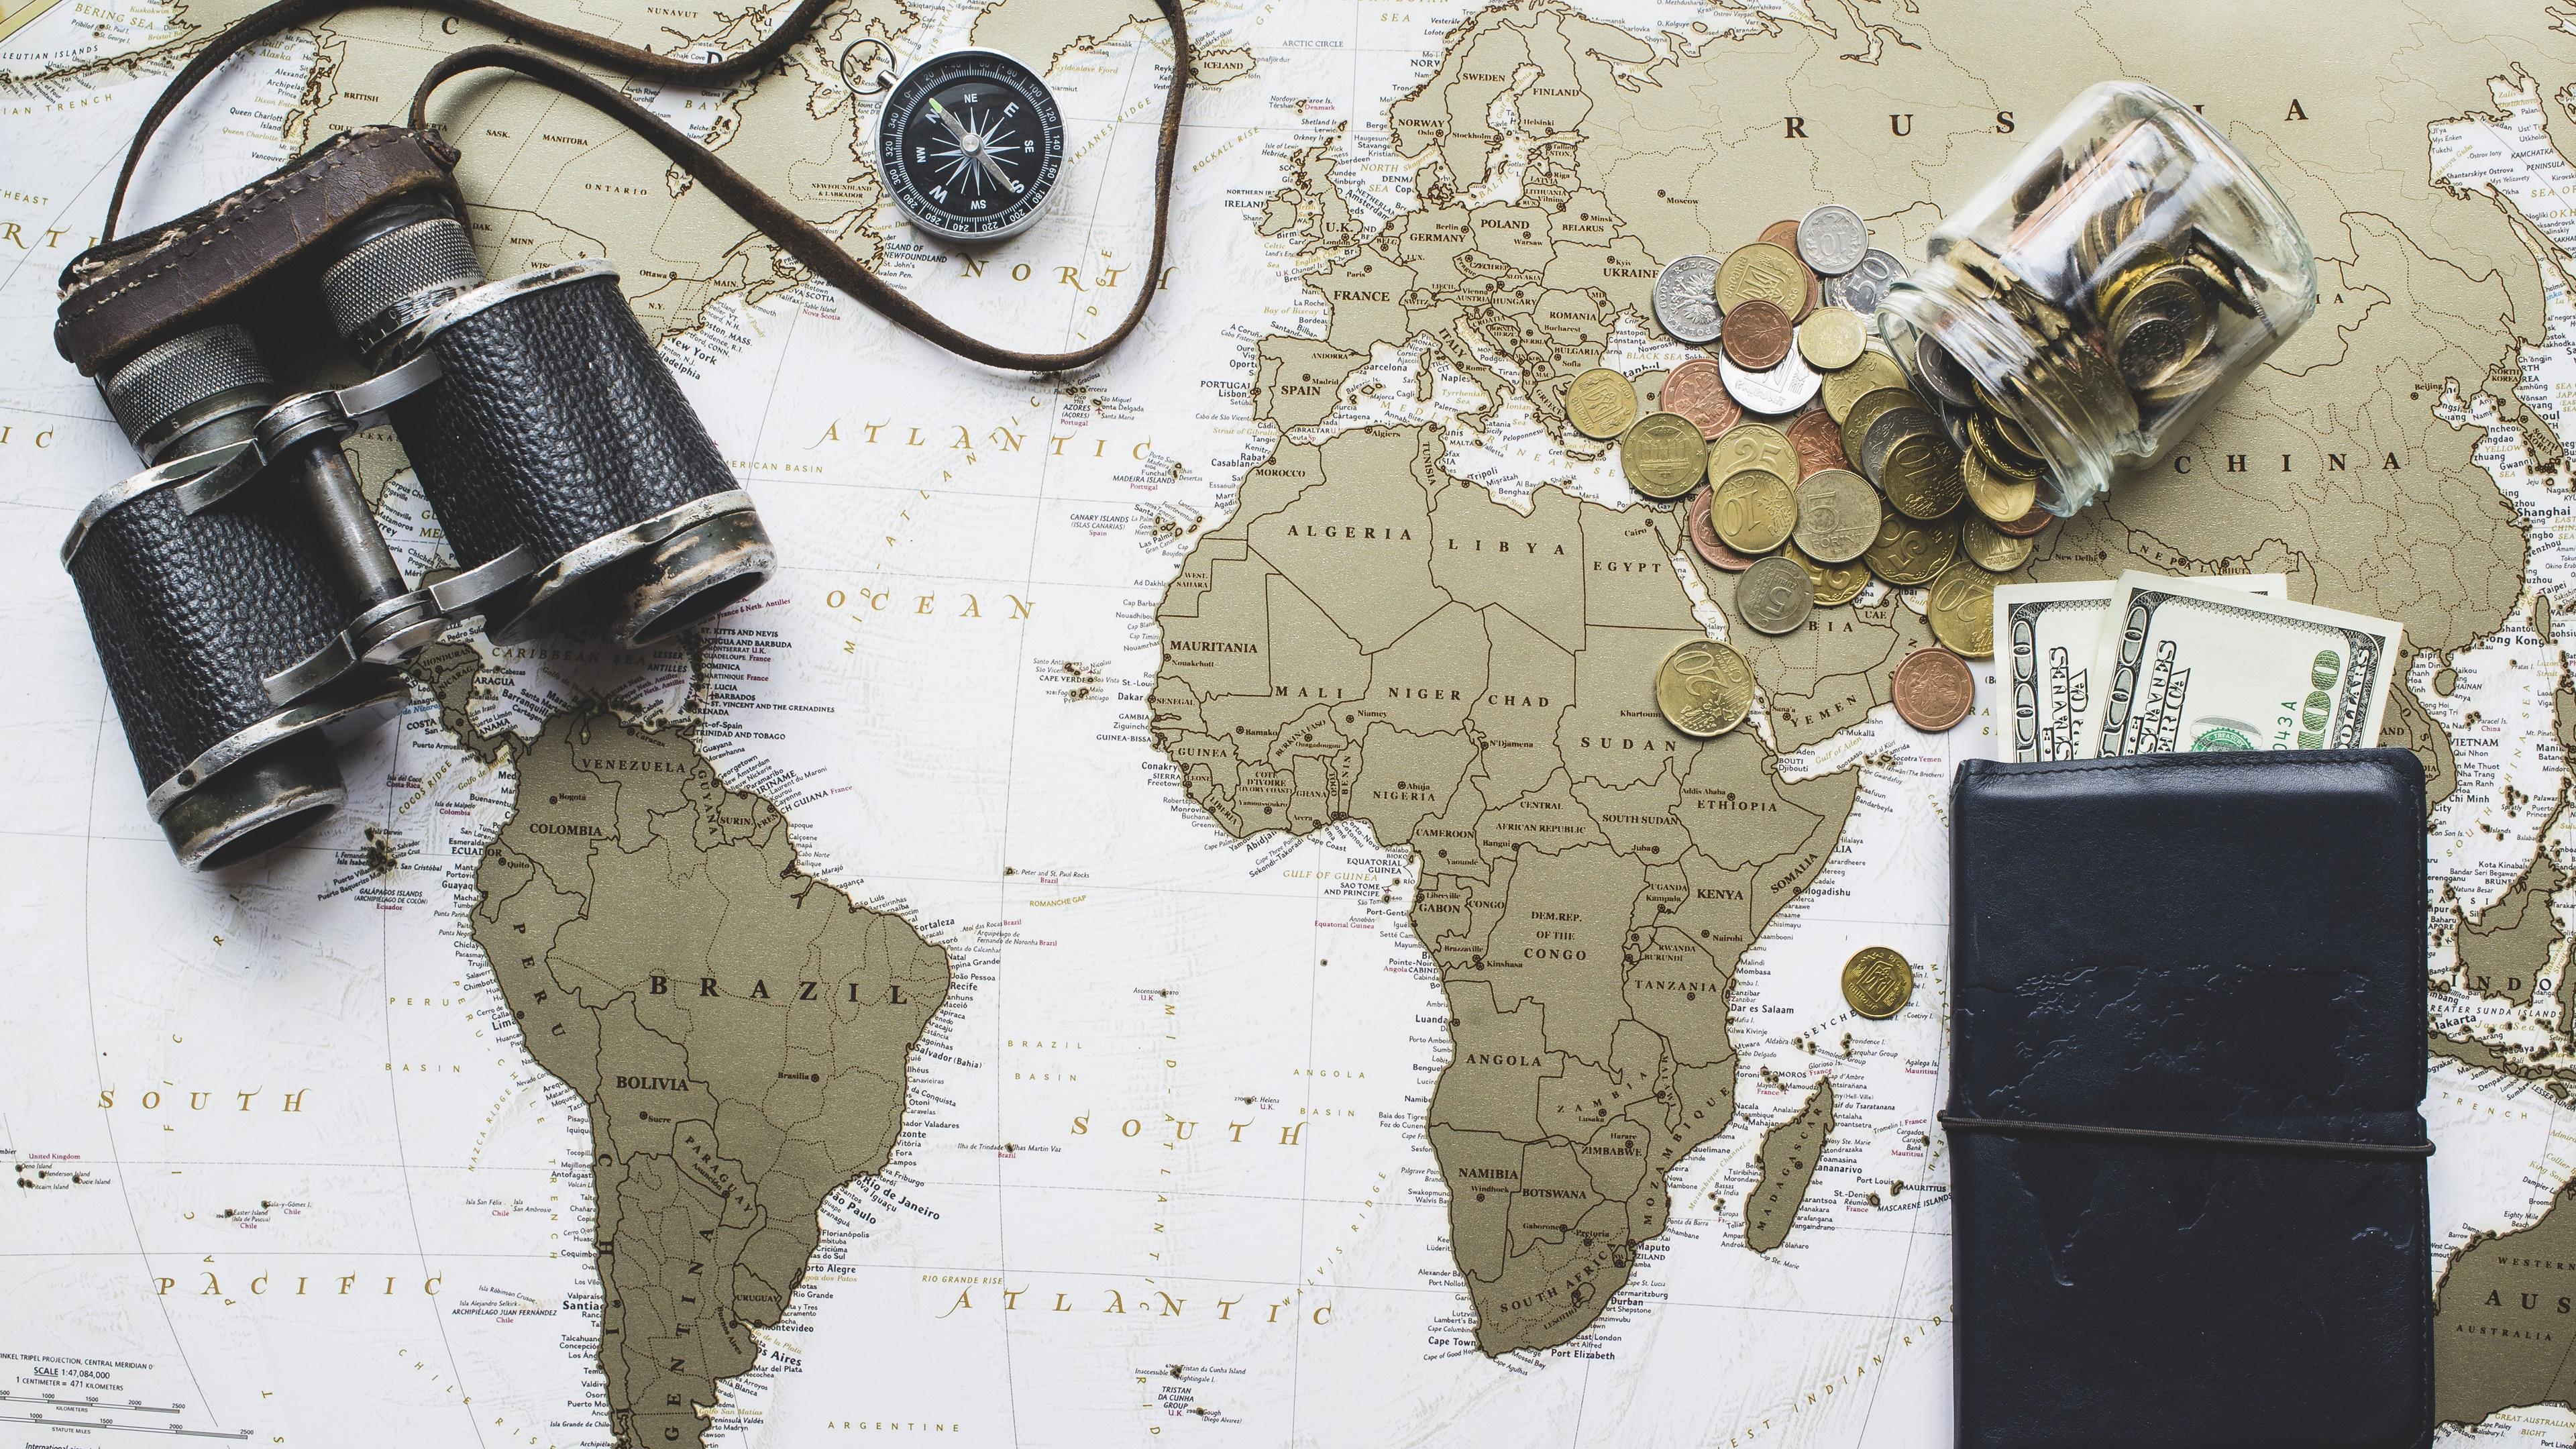 Wallpaper Binoculars World Map Purse Dollars 3840x2160 Uhd 4k